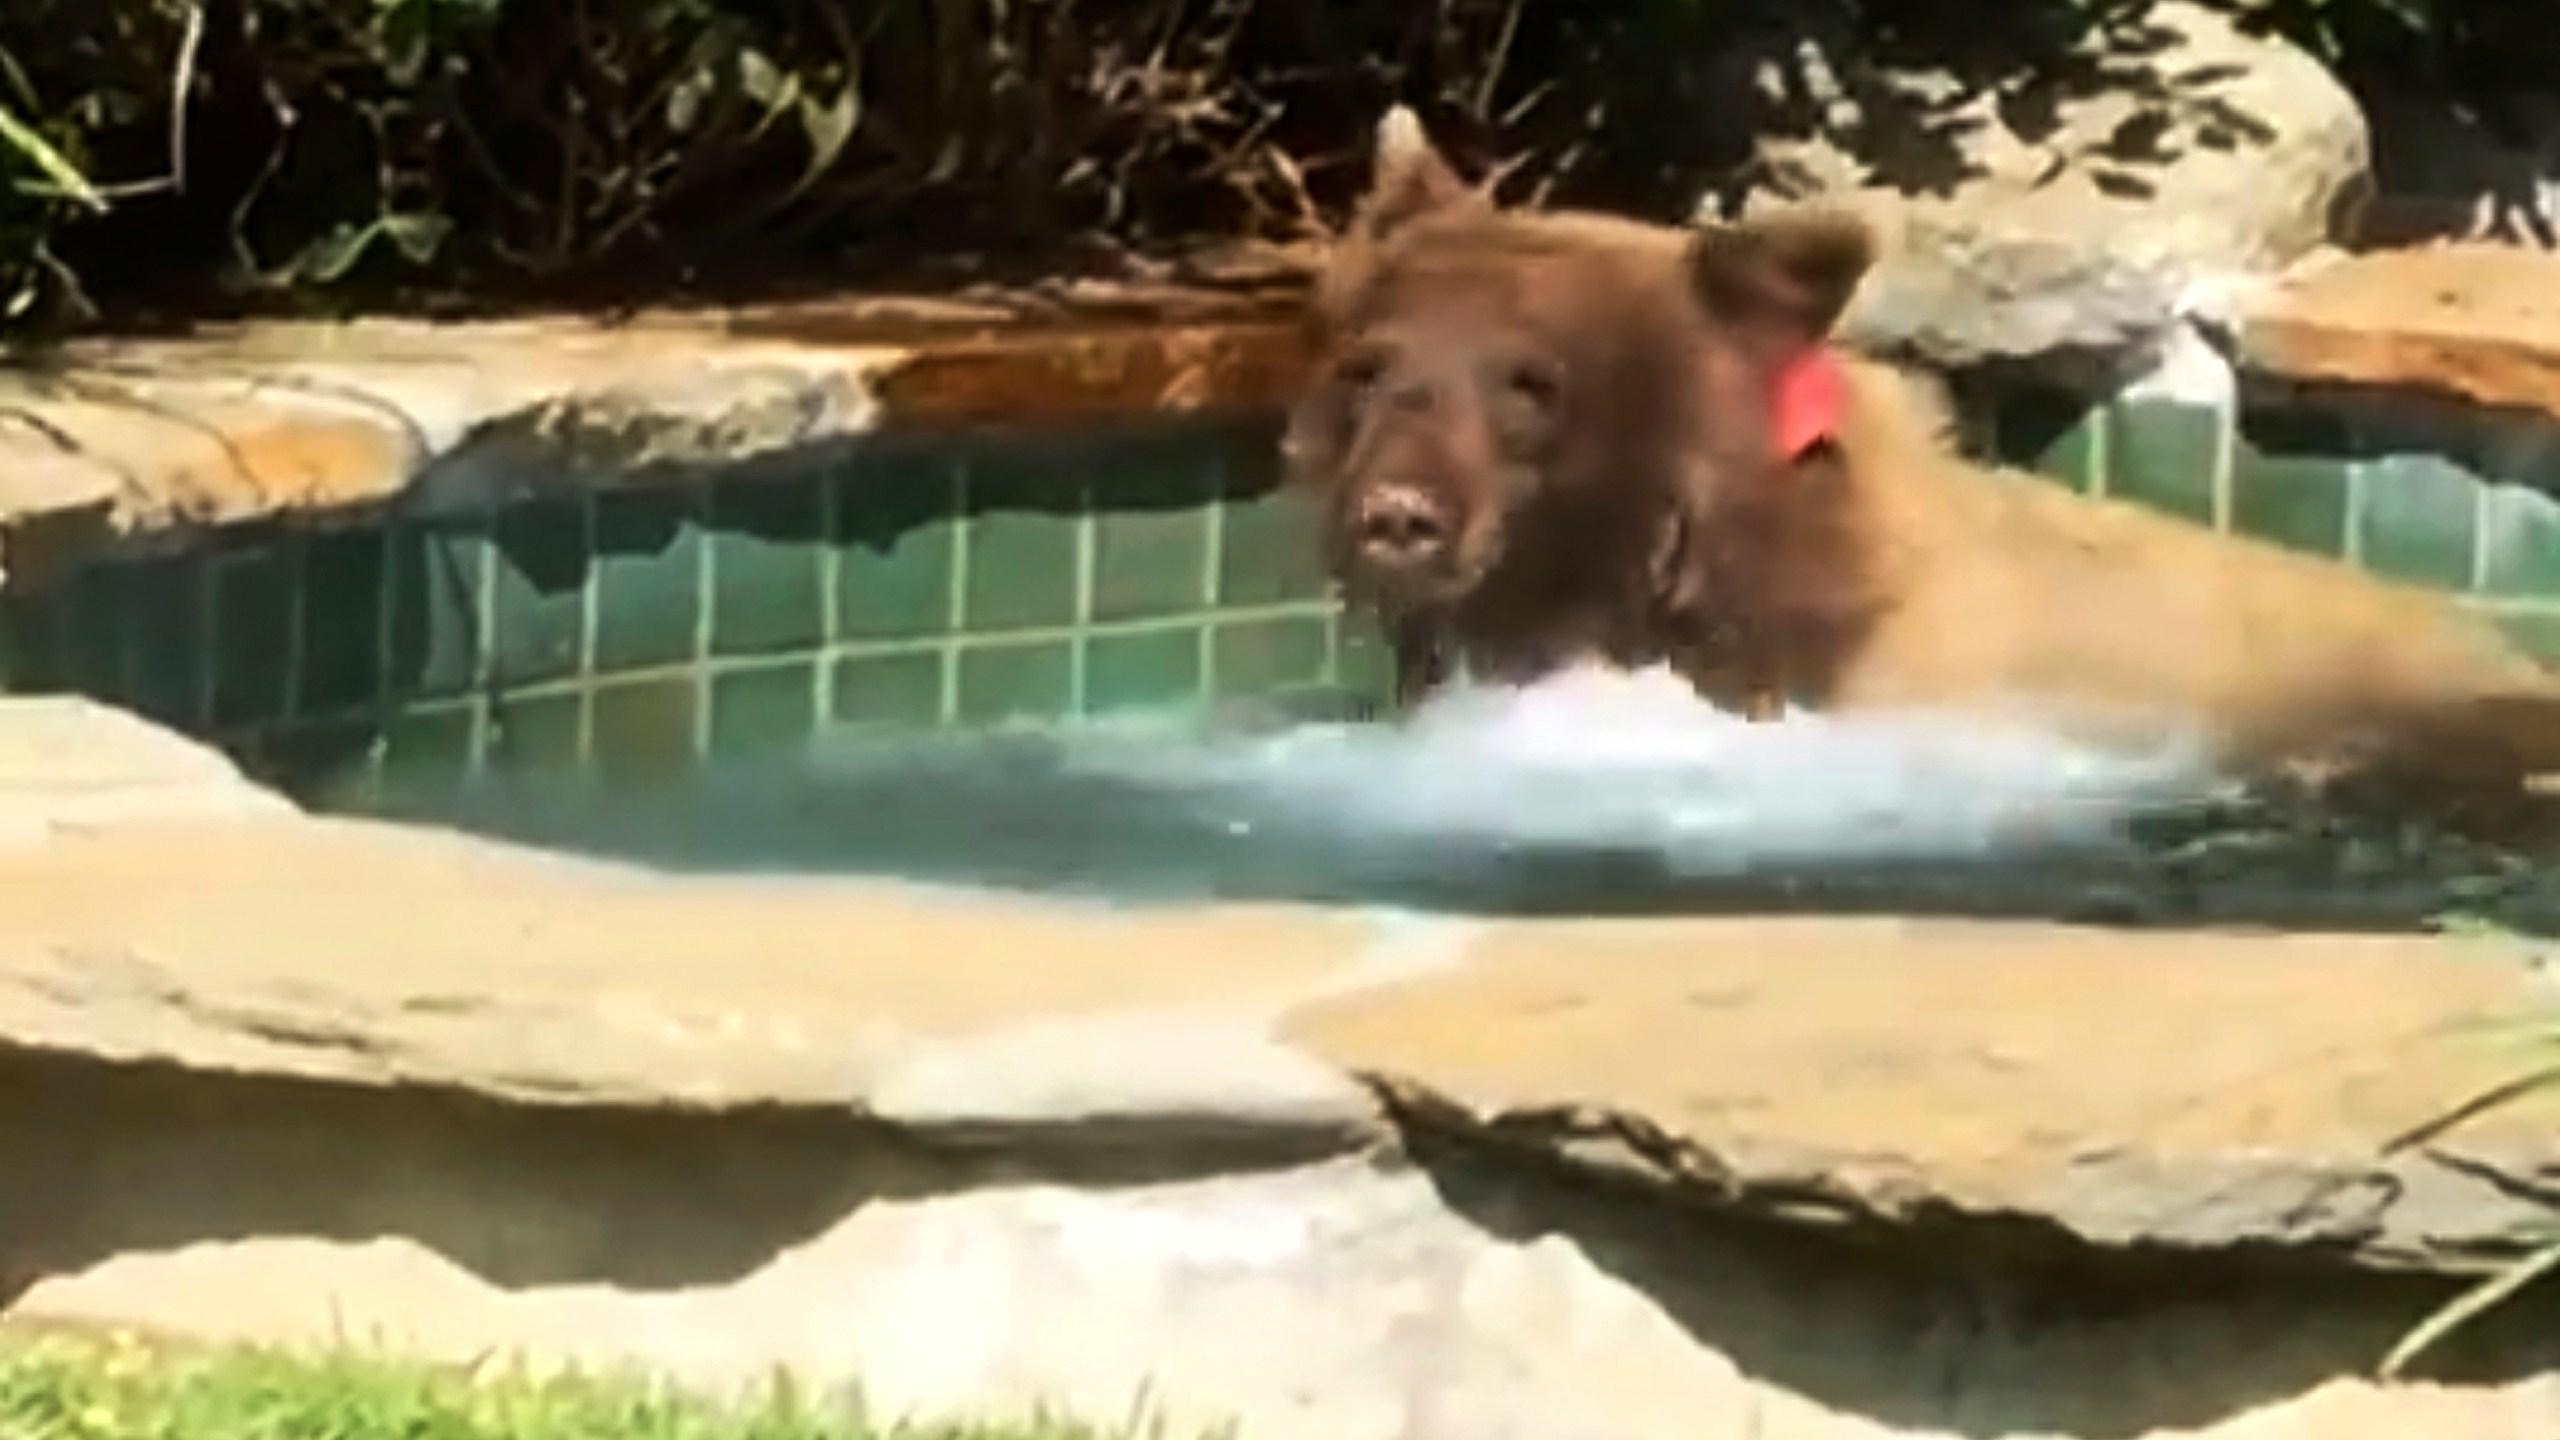 Bear_In_Hot_Tub_33190-159532.jpg36002792